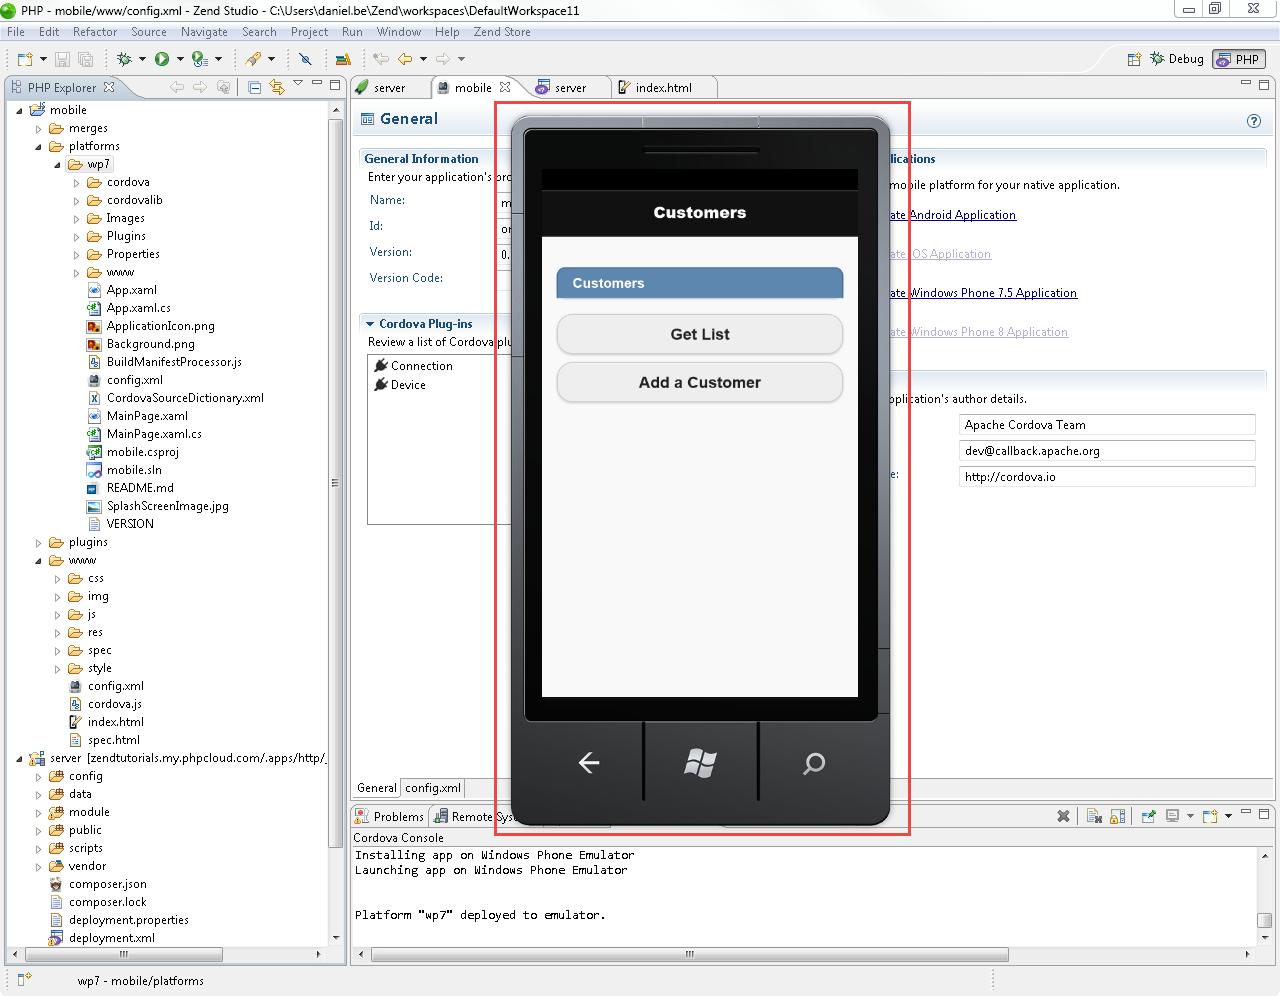 Developing Mobile Applications with Zend Studio - Zend Studio 11